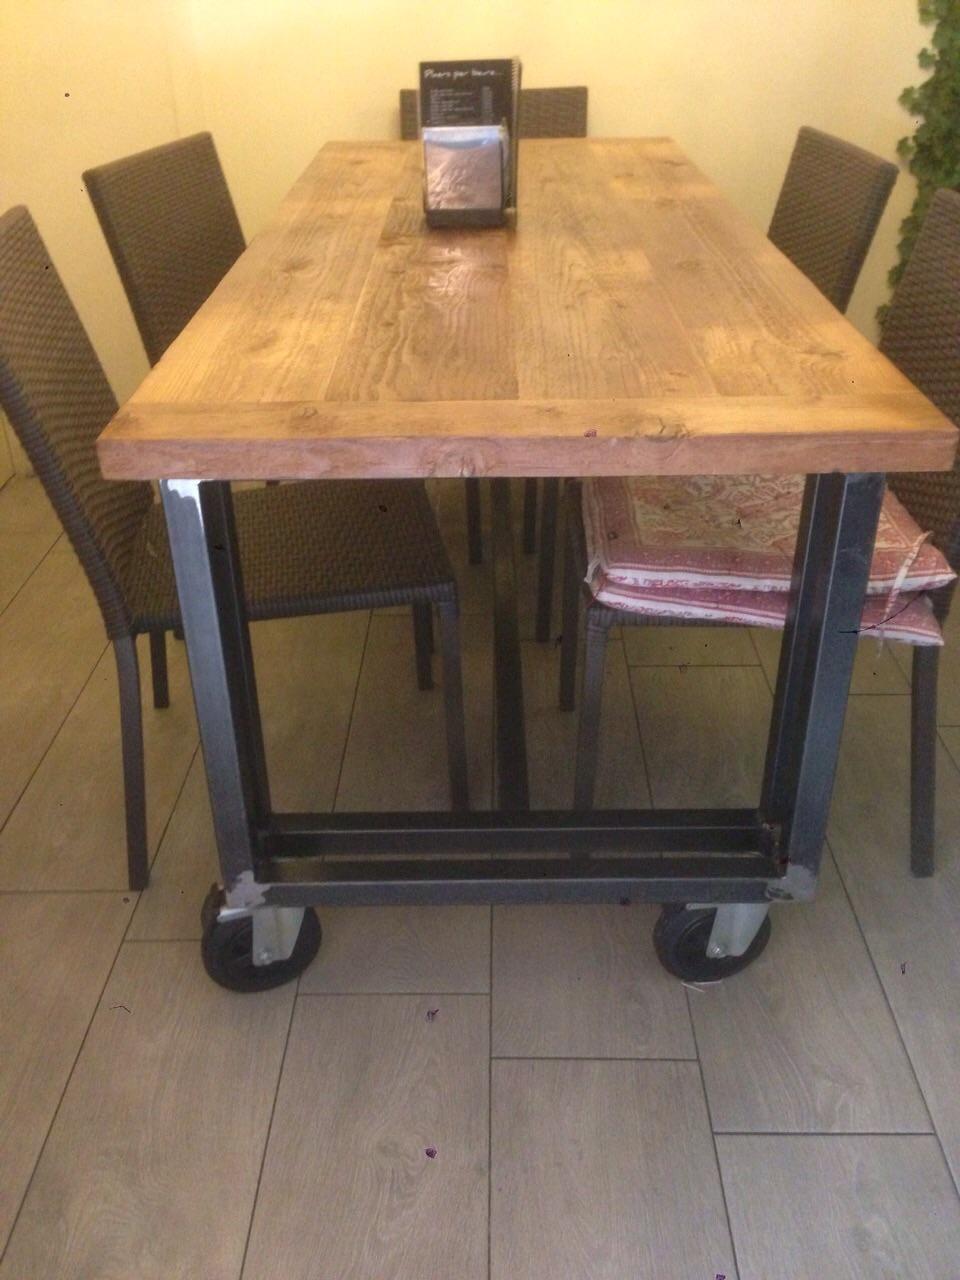 Muebles hierro artesanales 20170813232550 for Muebles artesanales